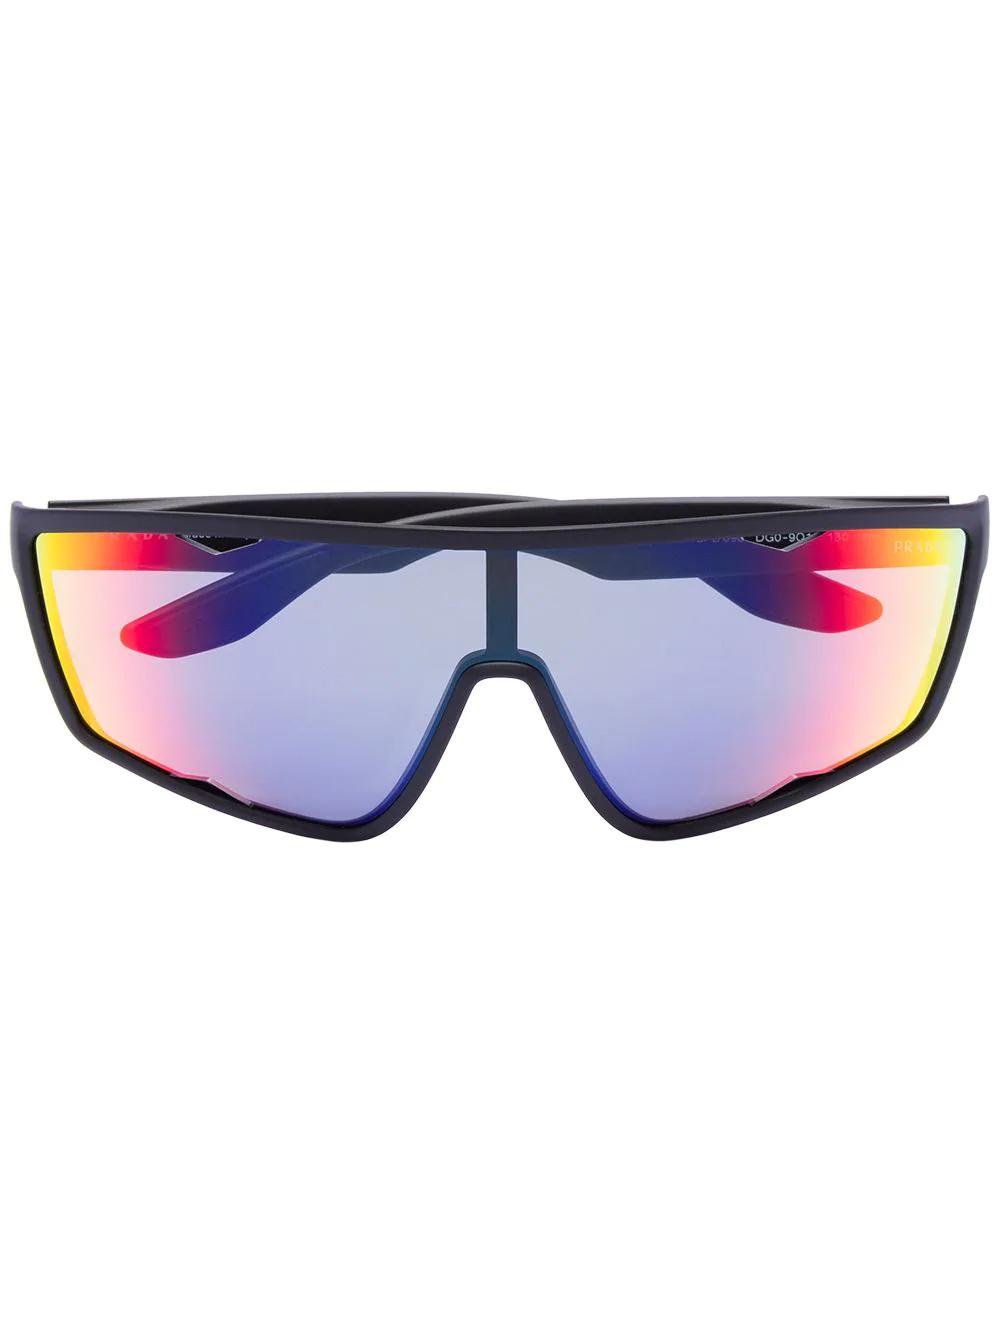 Prada Eyewear 629лв